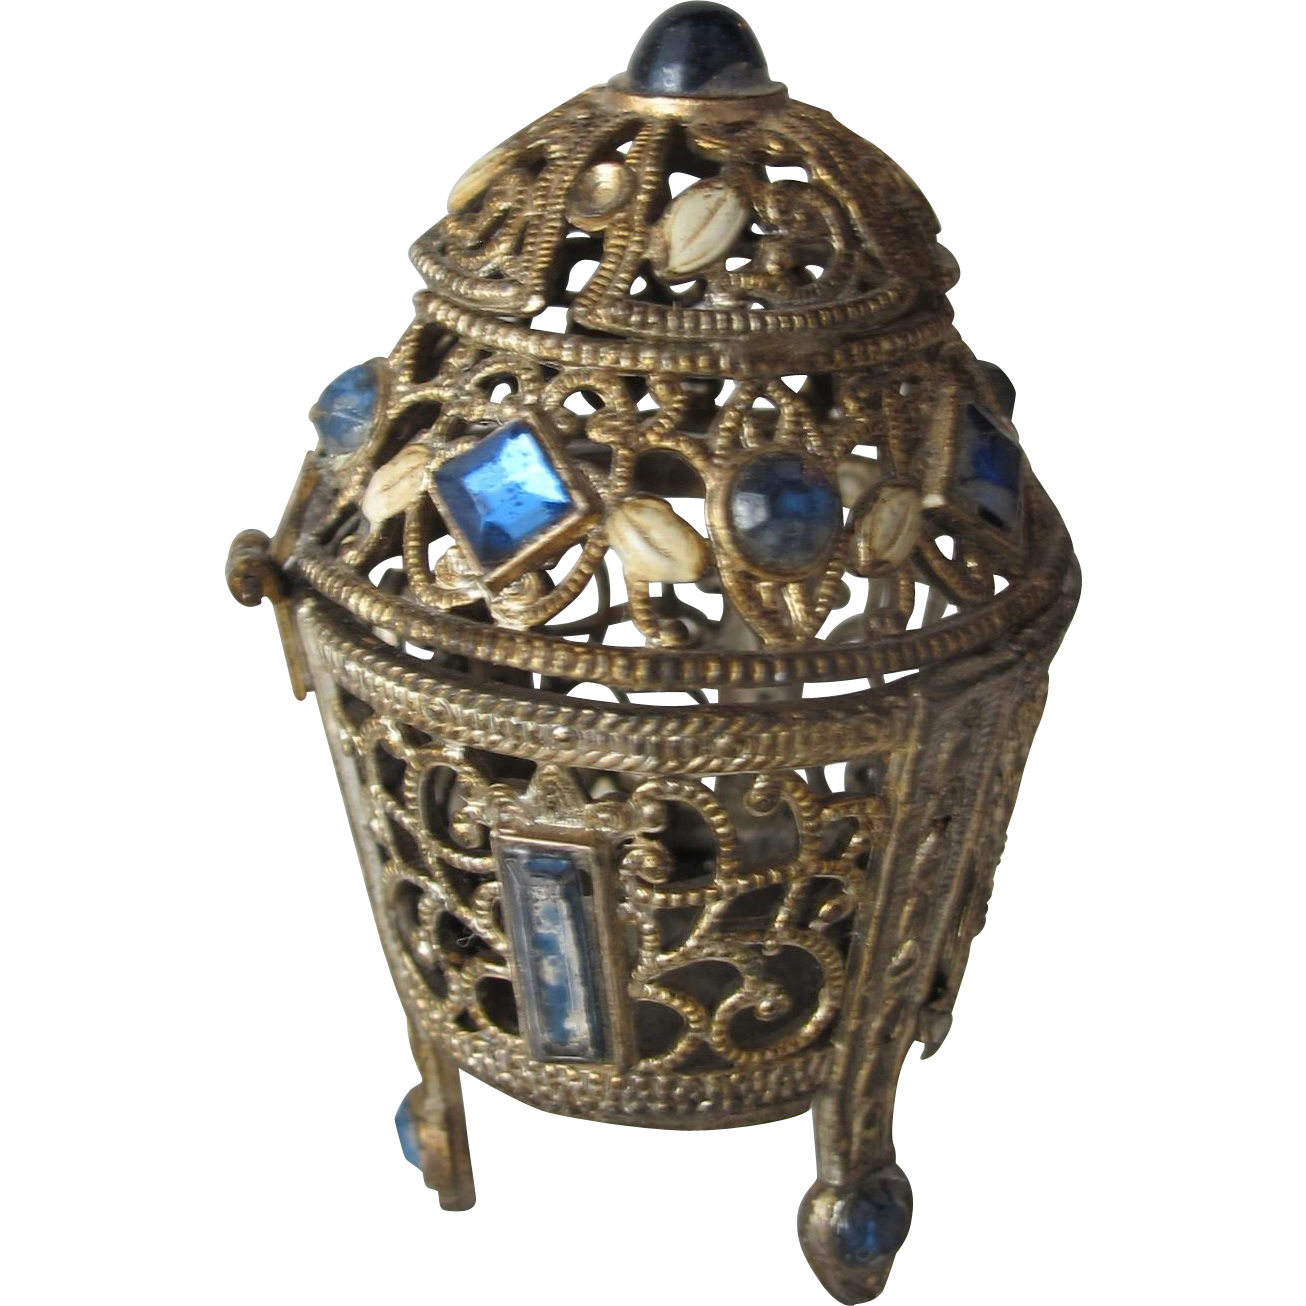 Irice Perfume Bottle Container Jeweled Filigree with Enamel Czechoslovakia